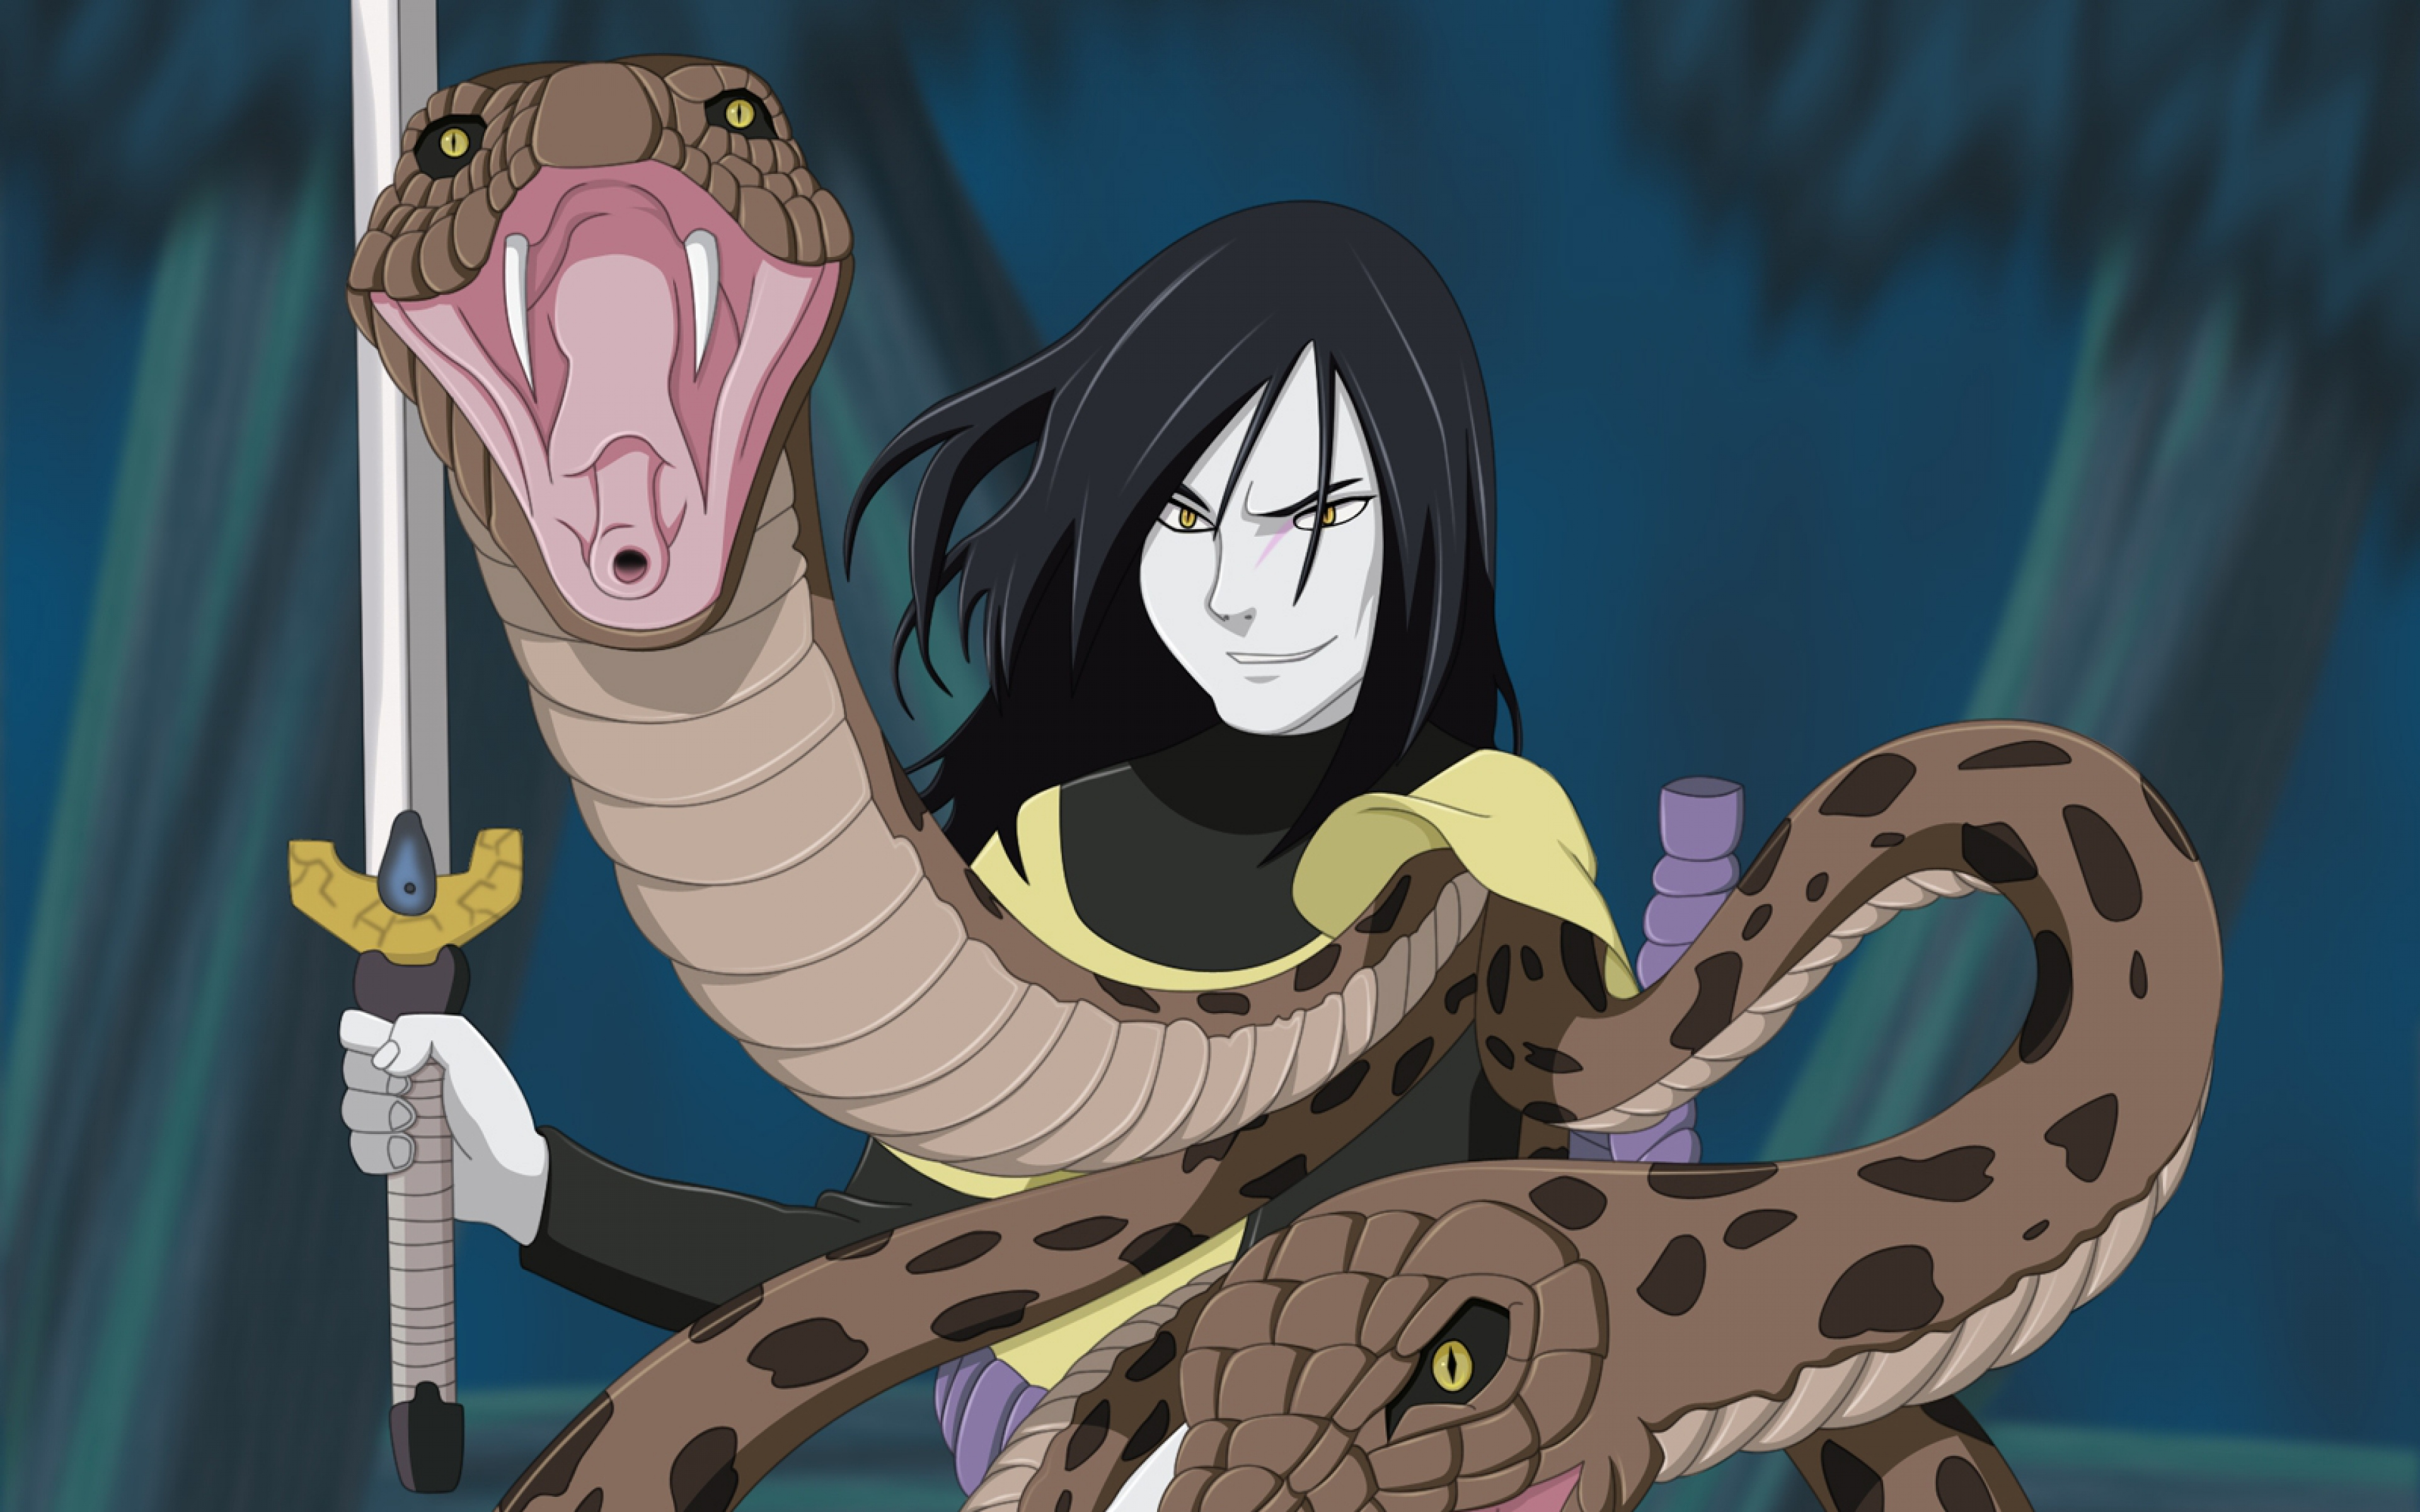 44 446056 hd background orochimaru naruto snake fangs sword anime